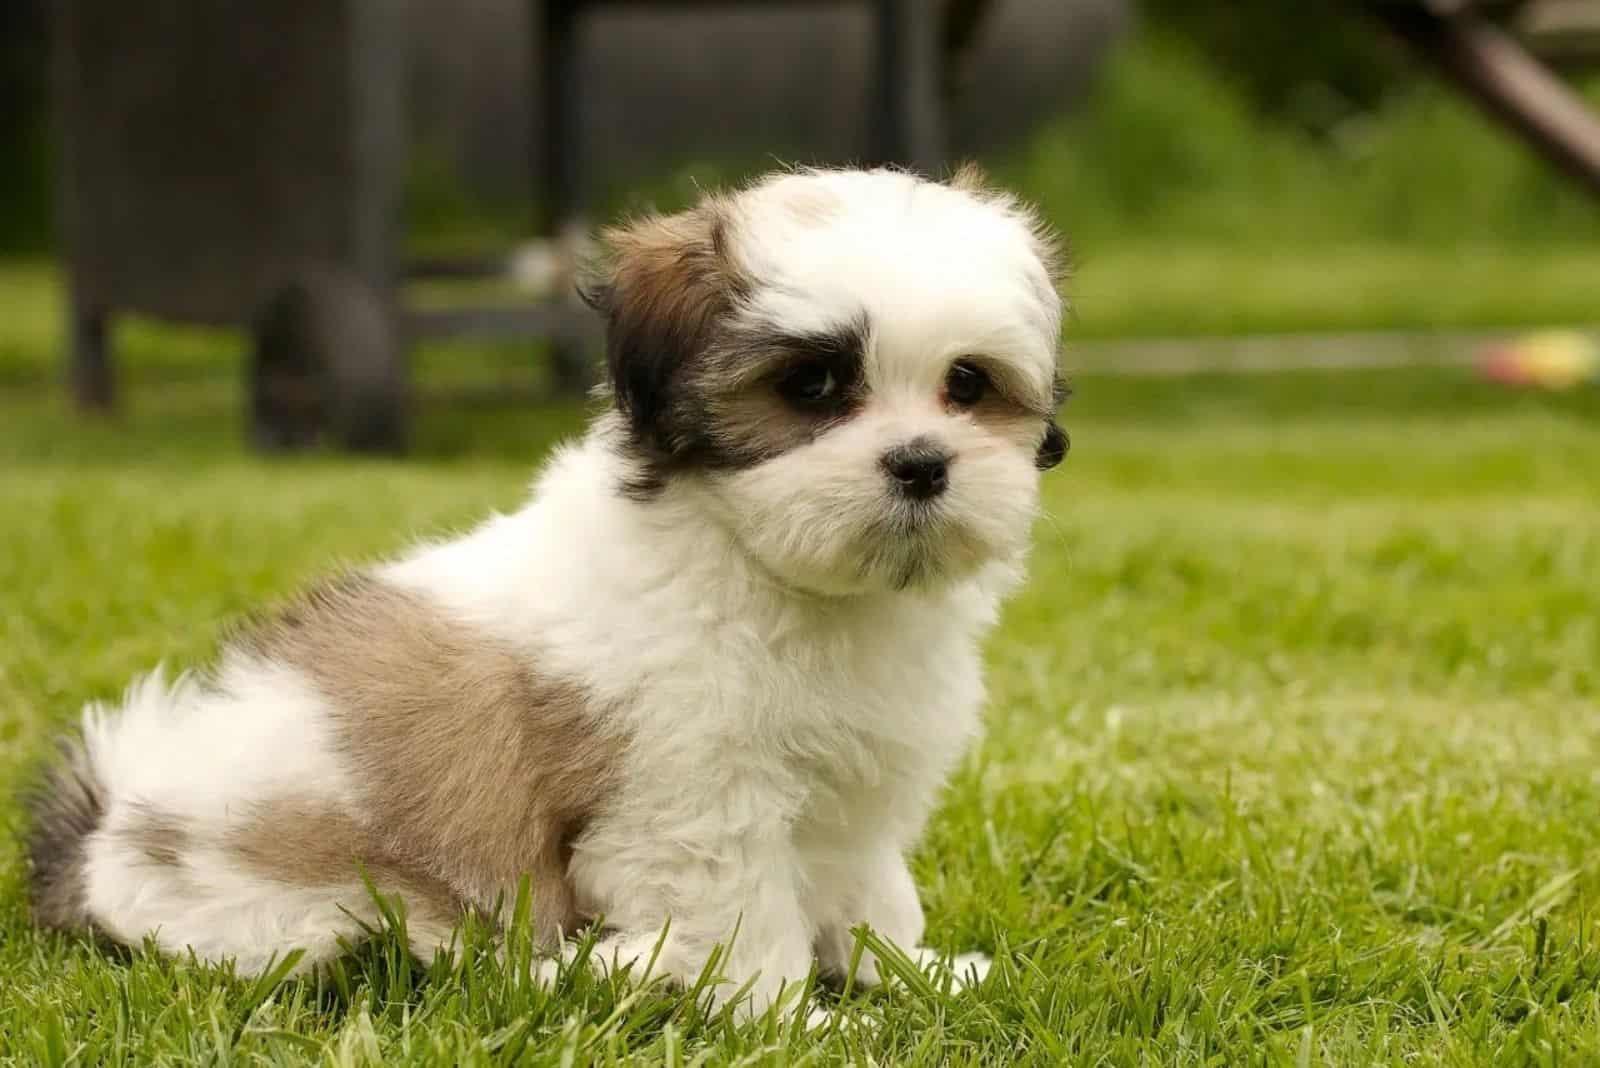 Kyi Leo Hund im Gras